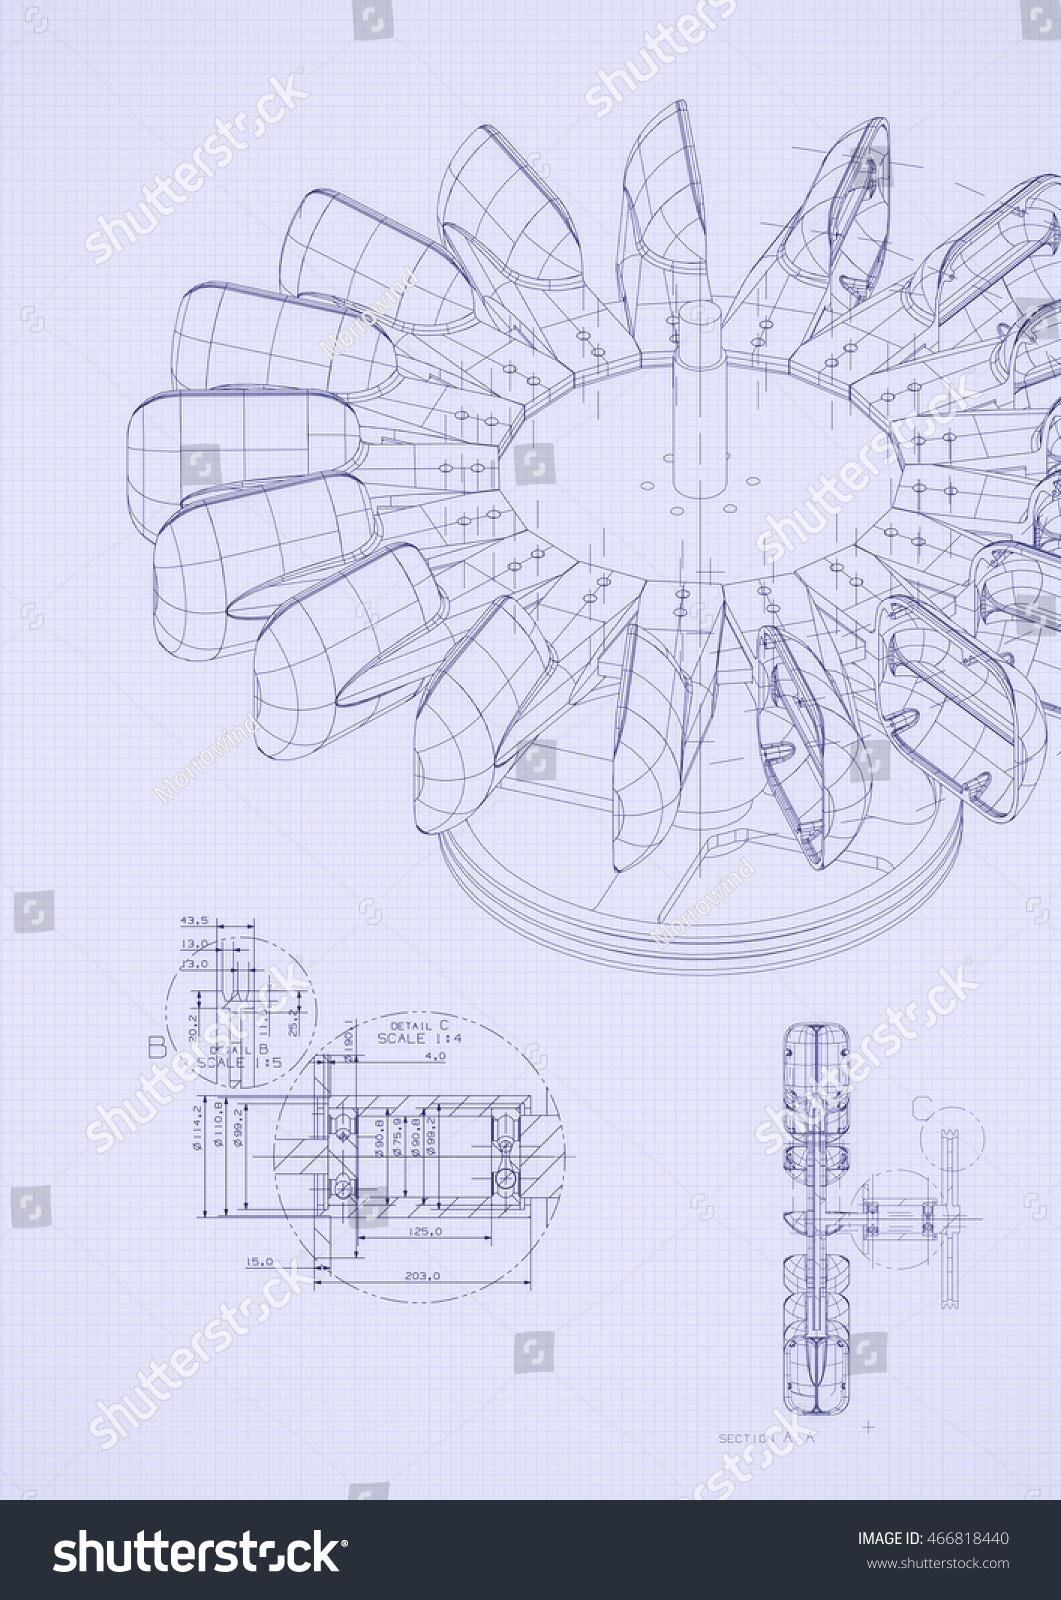 Blueprint detail top view stock illustration 466818440 shutterstock blueprint detail from top view malvernweather Images